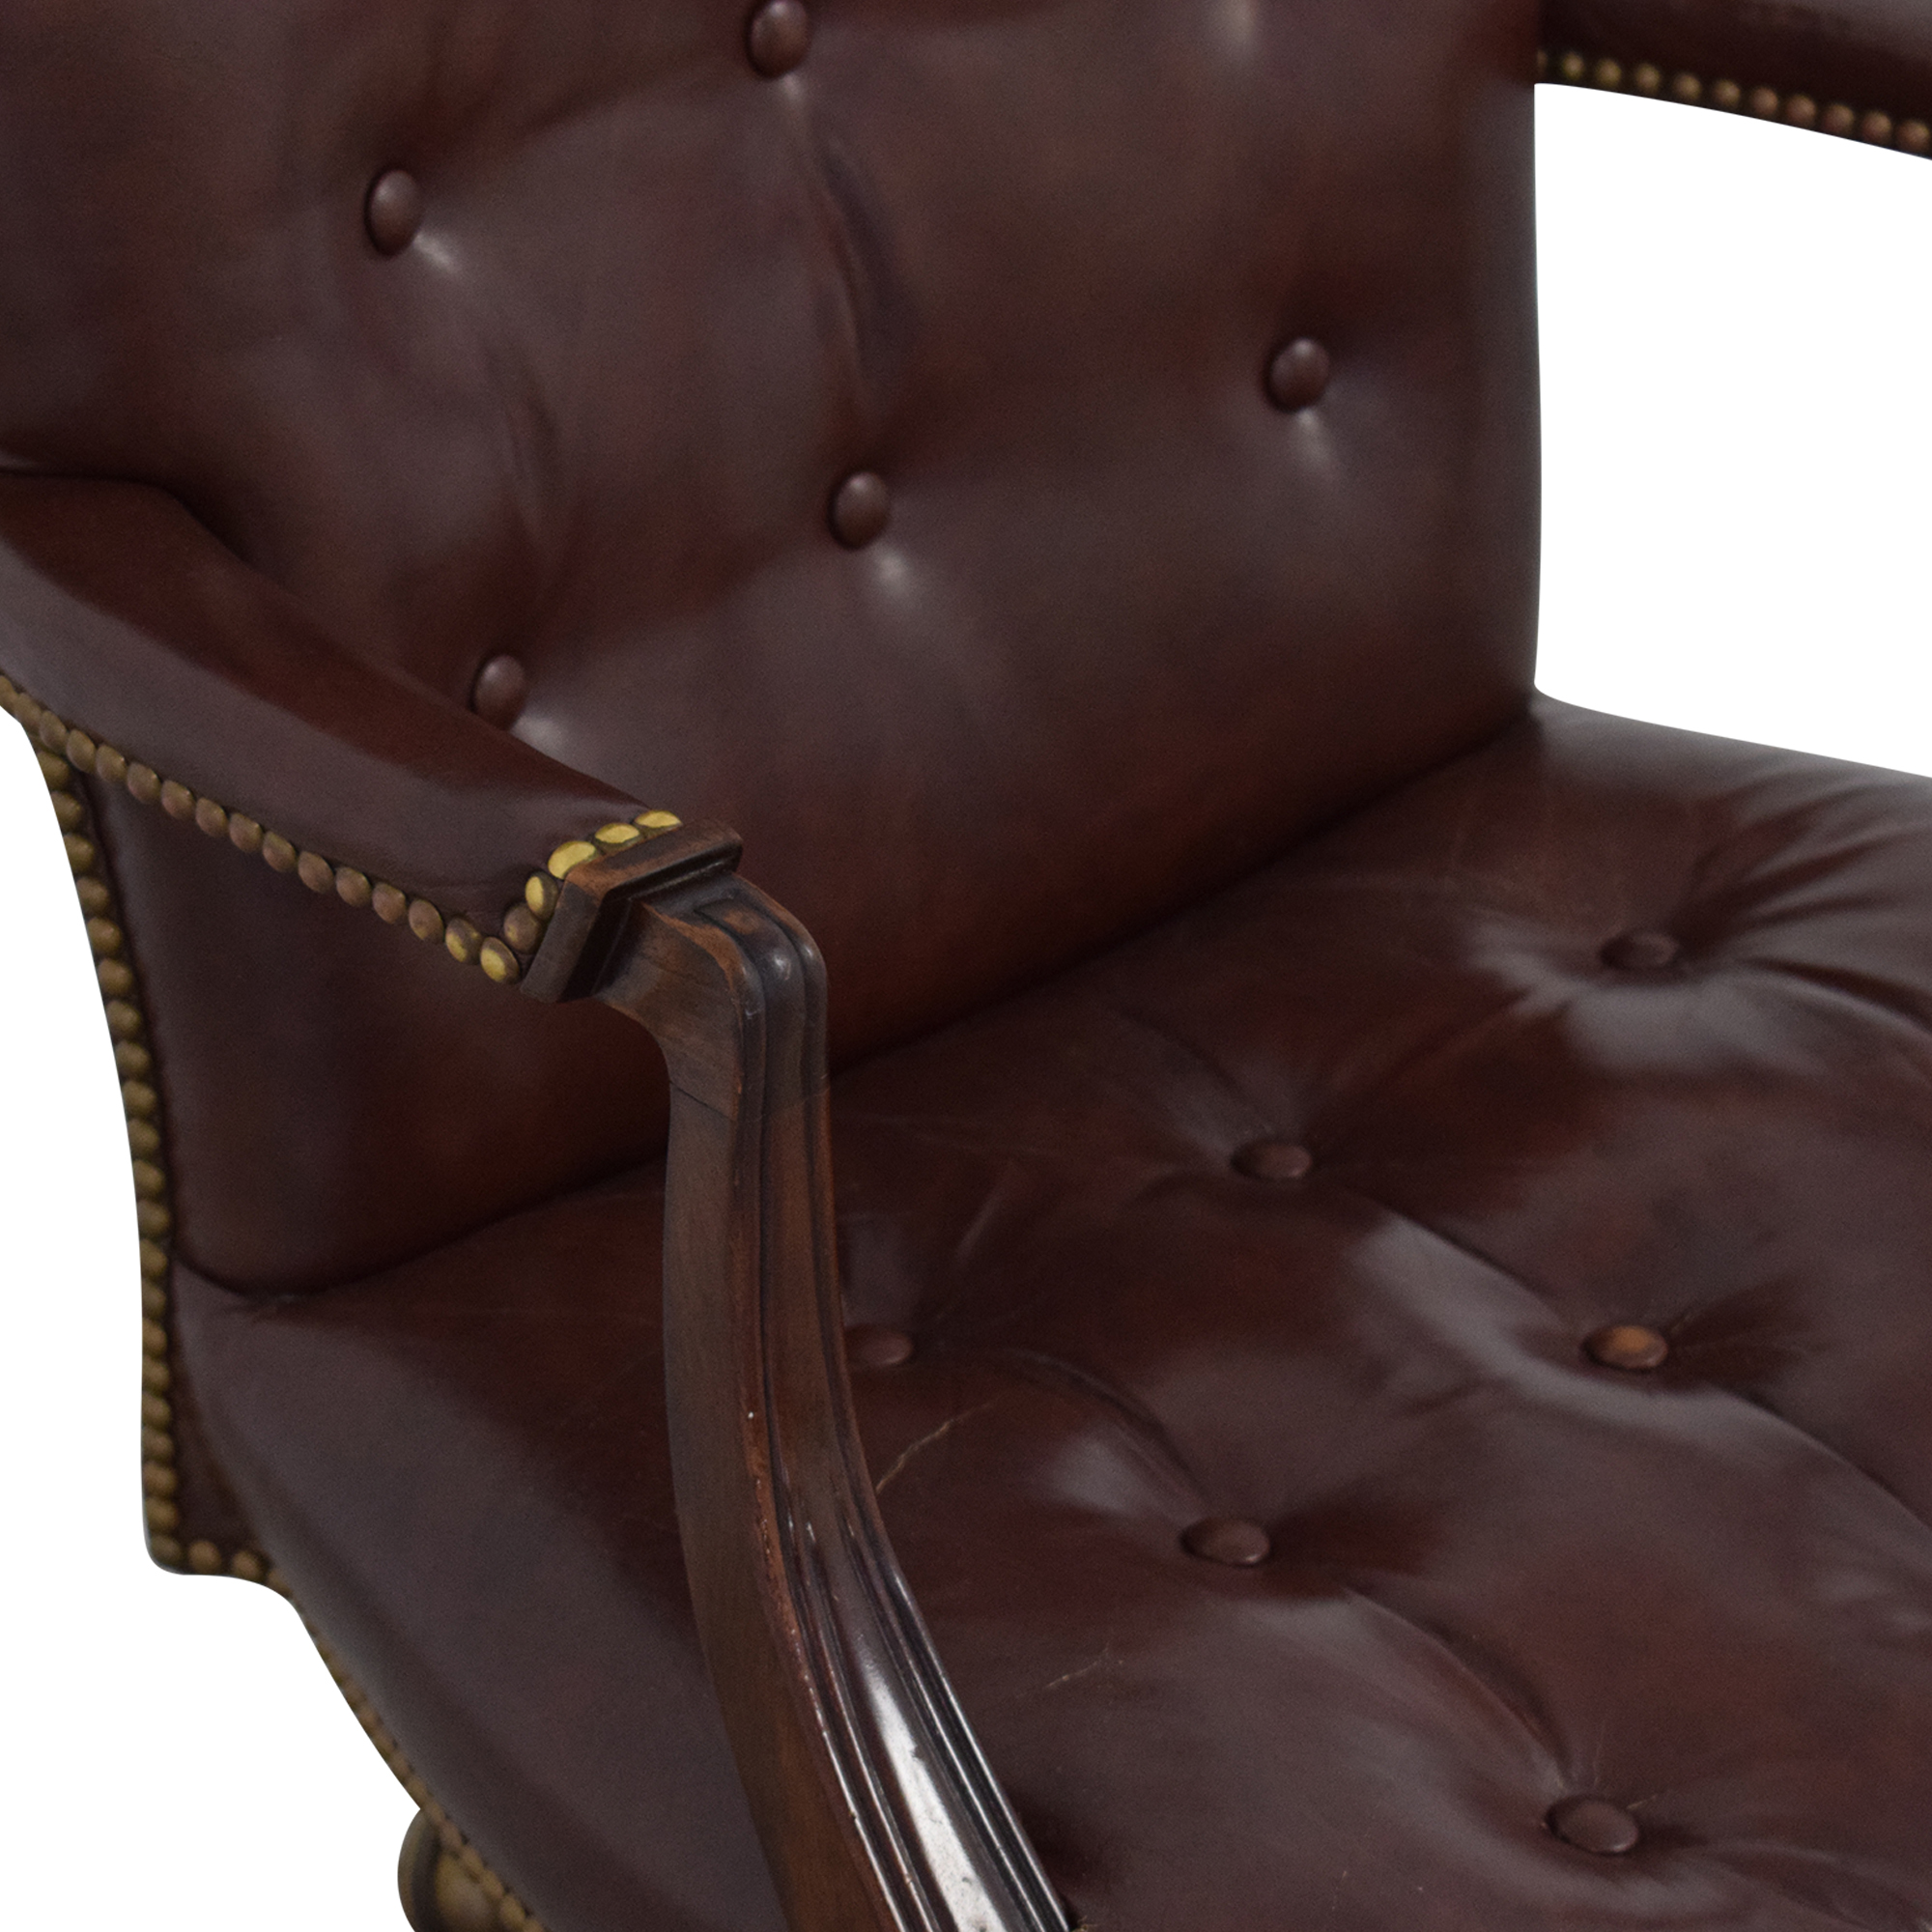 Hickory Chair Hickory Chair Swivel Tilt Desk Chair used